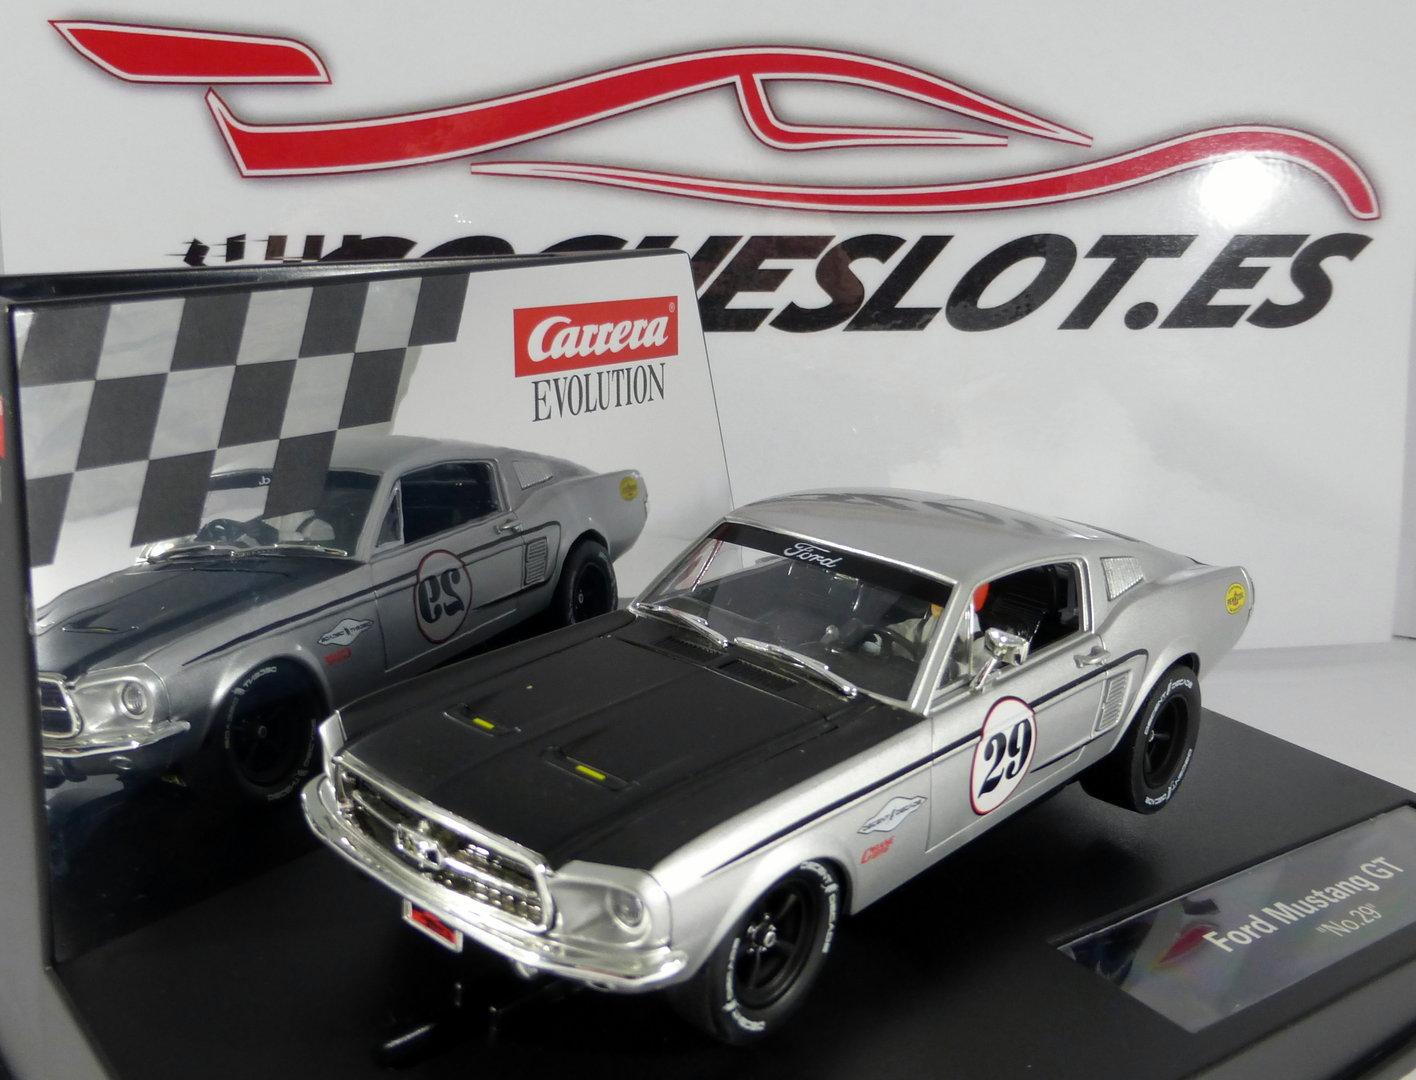 Evolution ford mustang gt nº29 ref 20027554 carrera